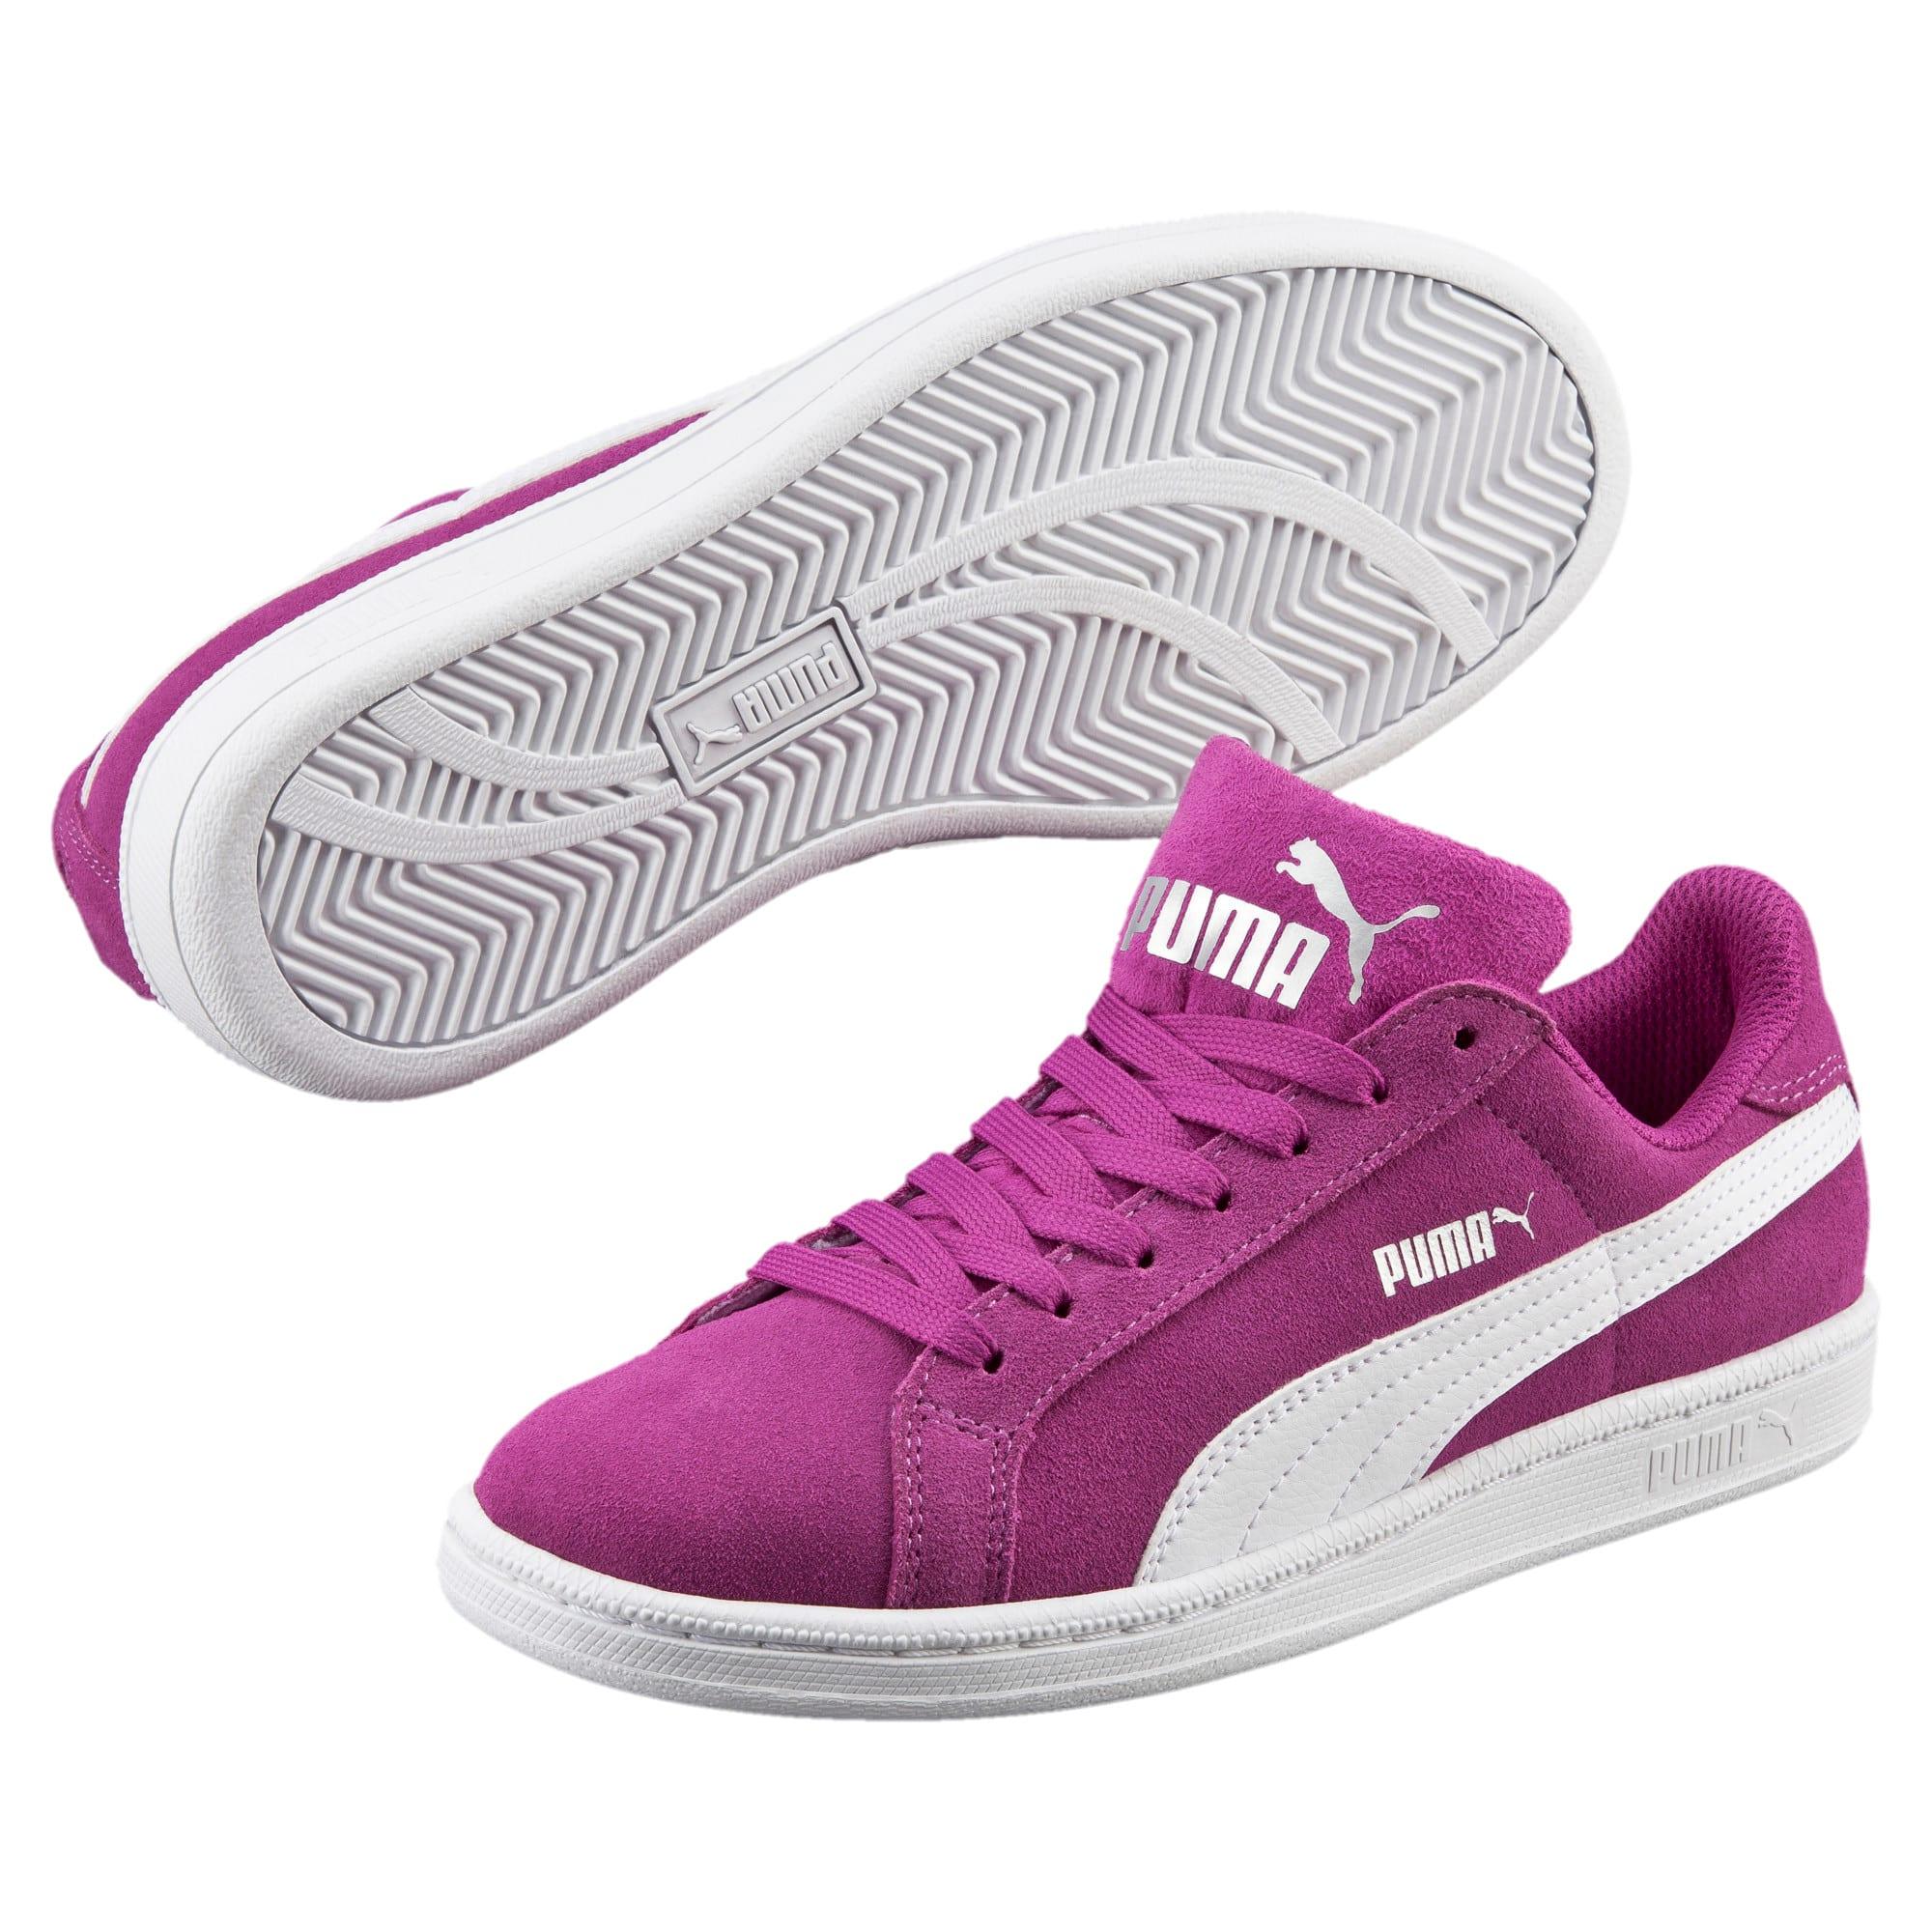 Thumbnail 2 of Smash Suede Sneakers JR, Hollyhock-Puma White, medium